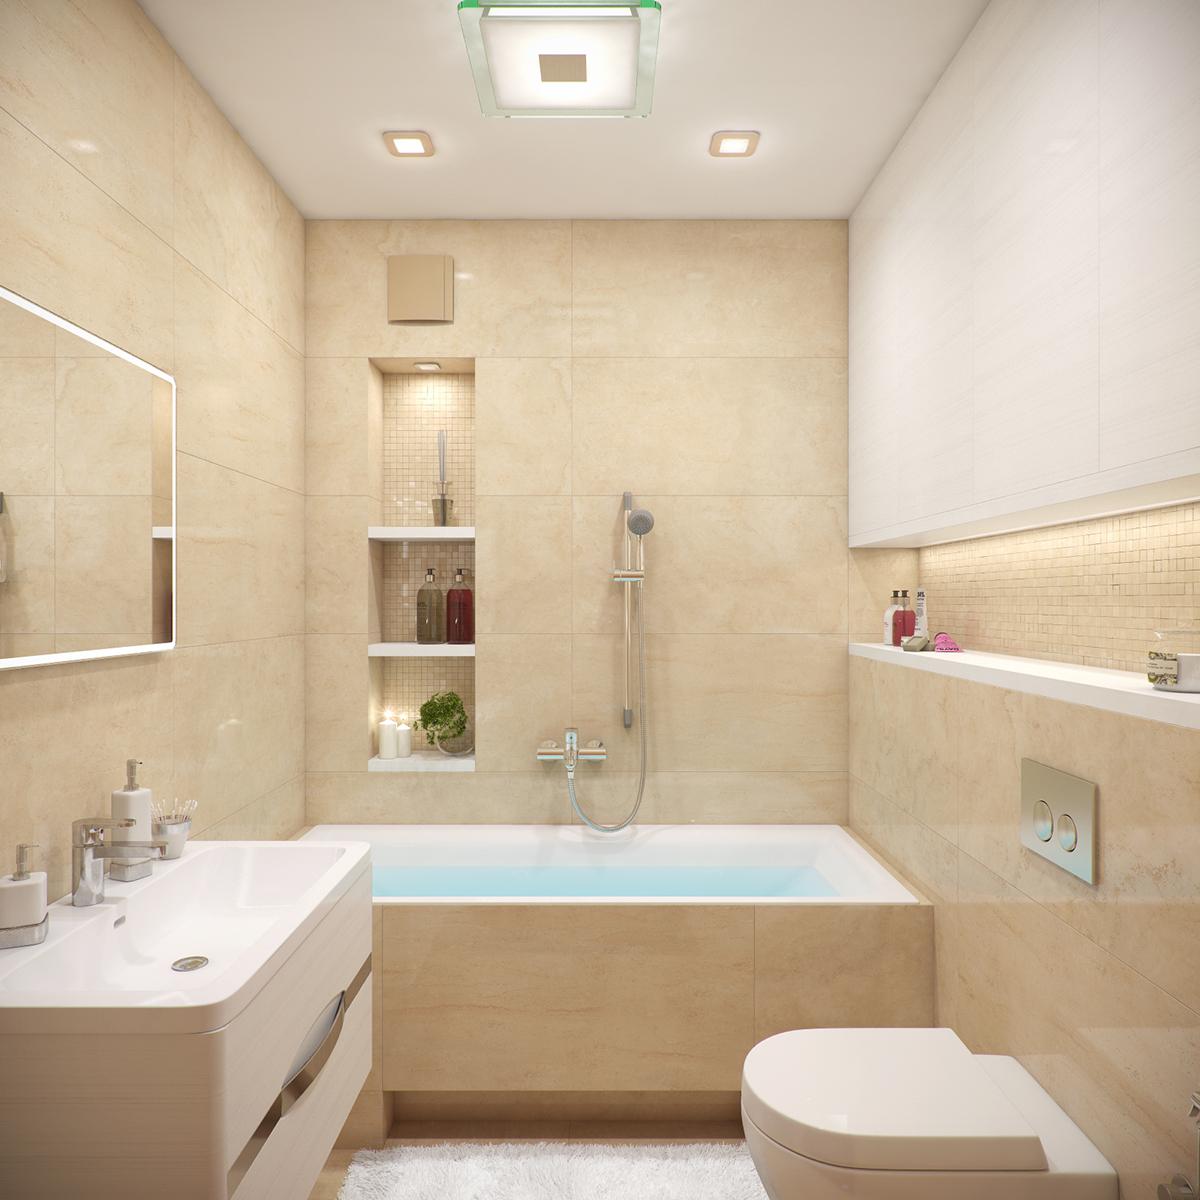 beige tiled bathroom